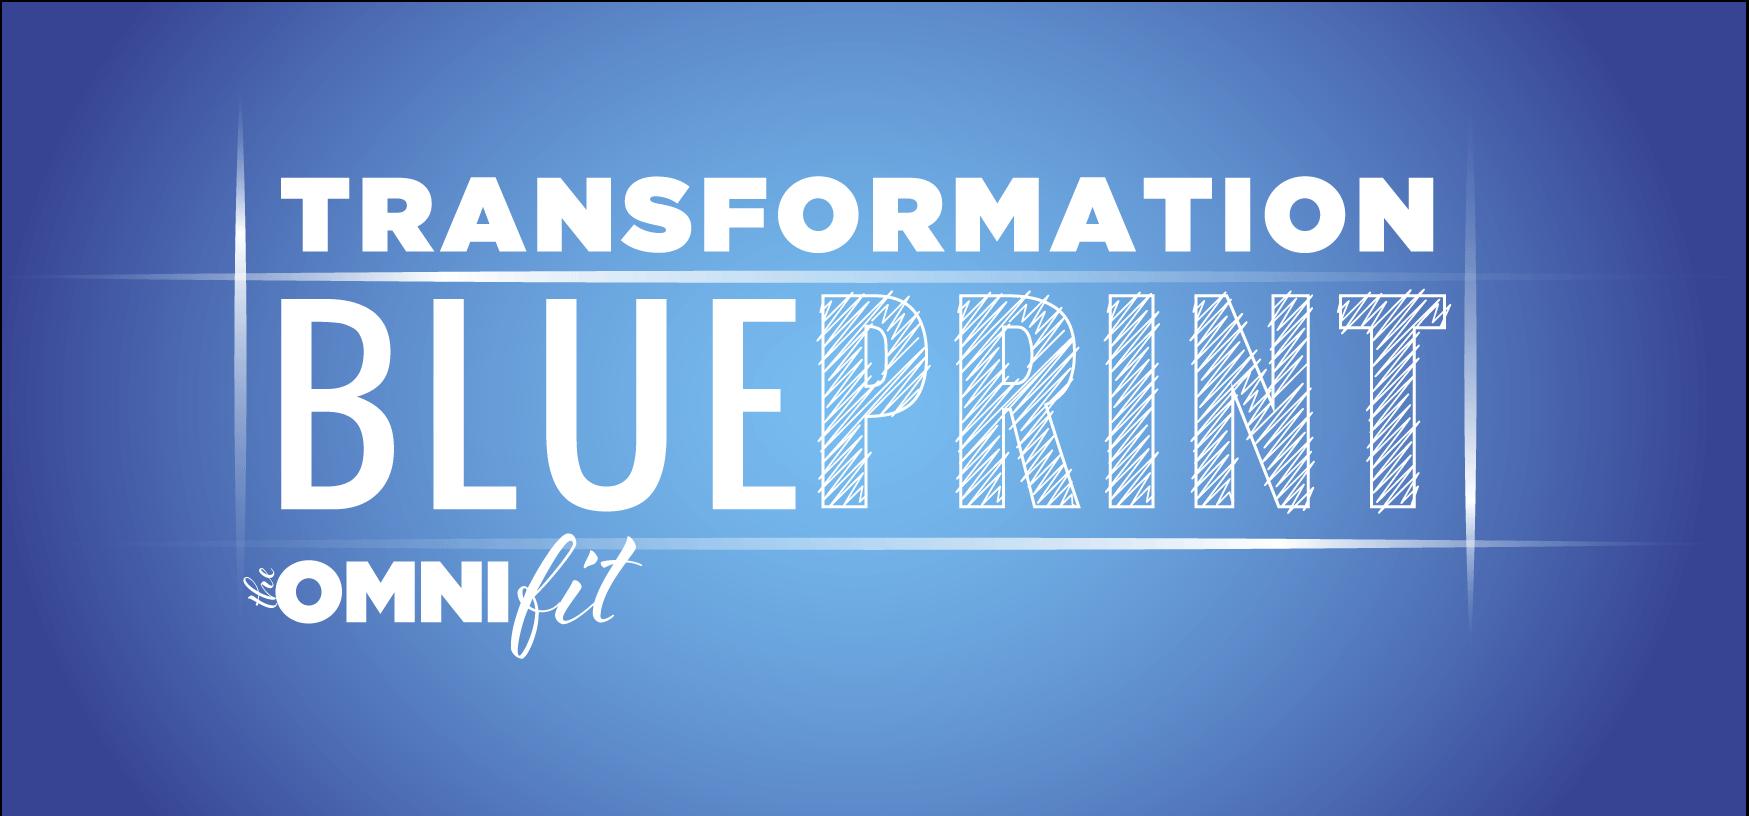 Transformaon Blueprint Training & Nutrition Coaching